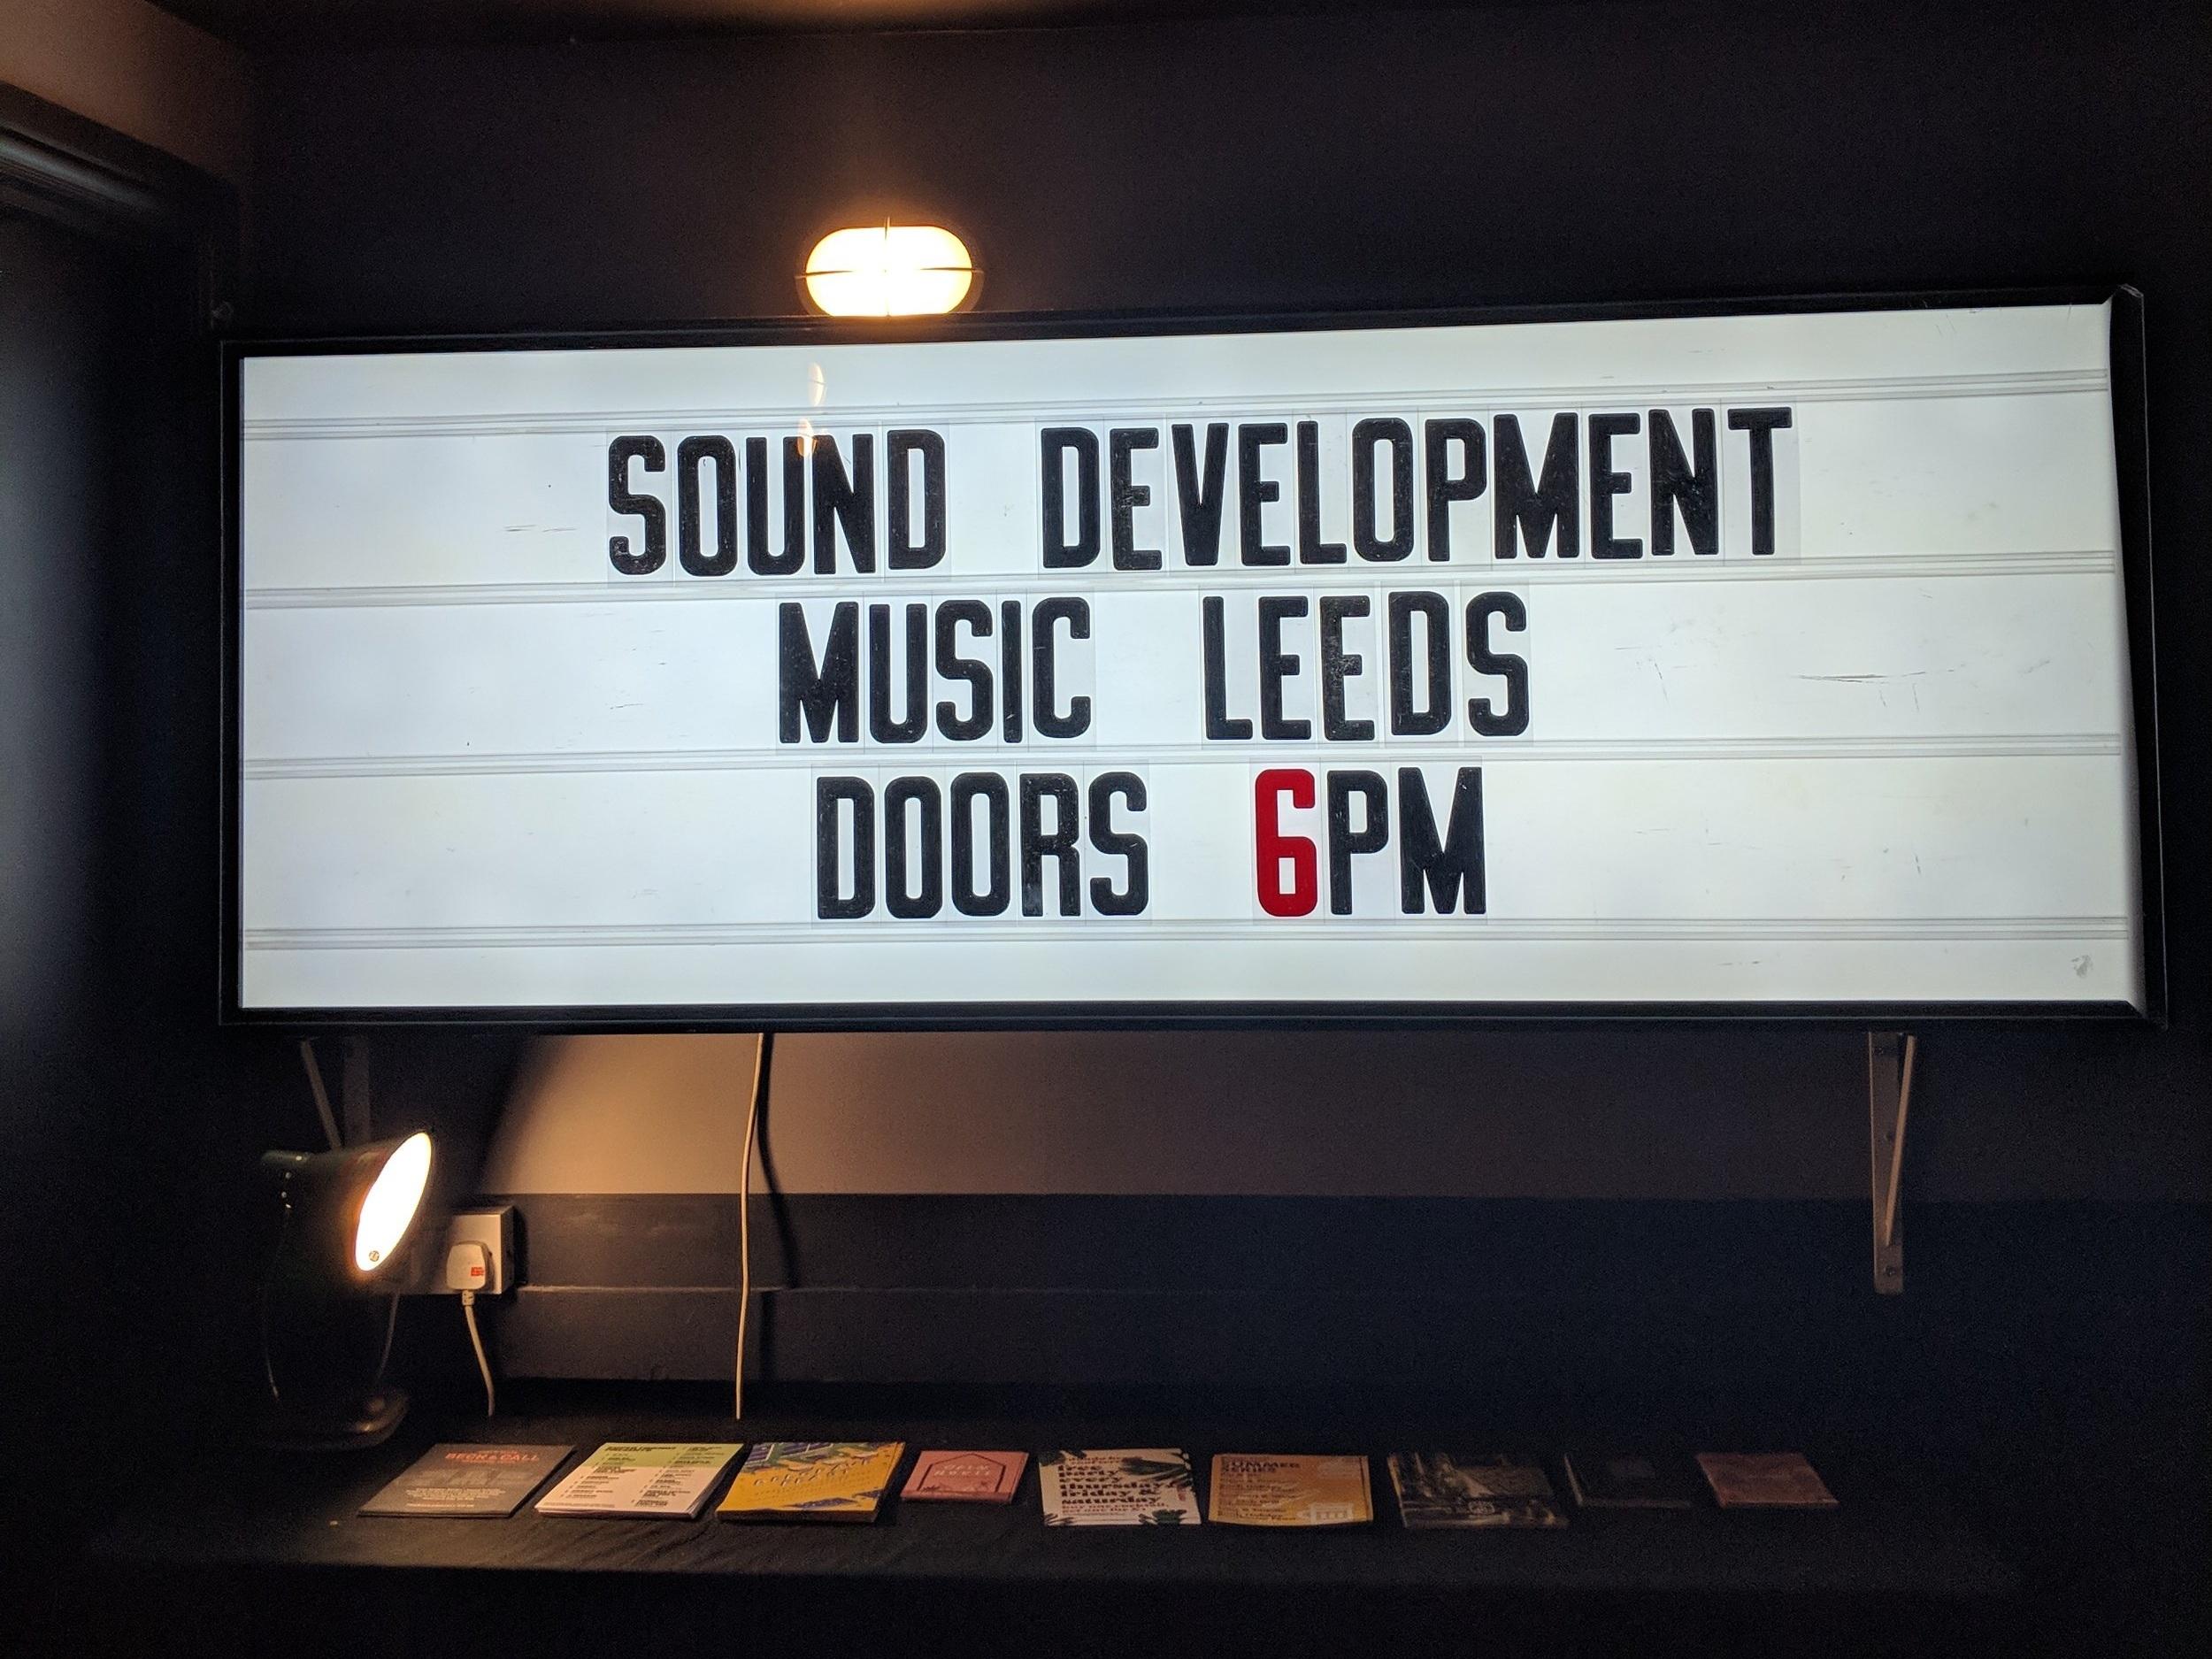 Sound Development Leeds - June 2019